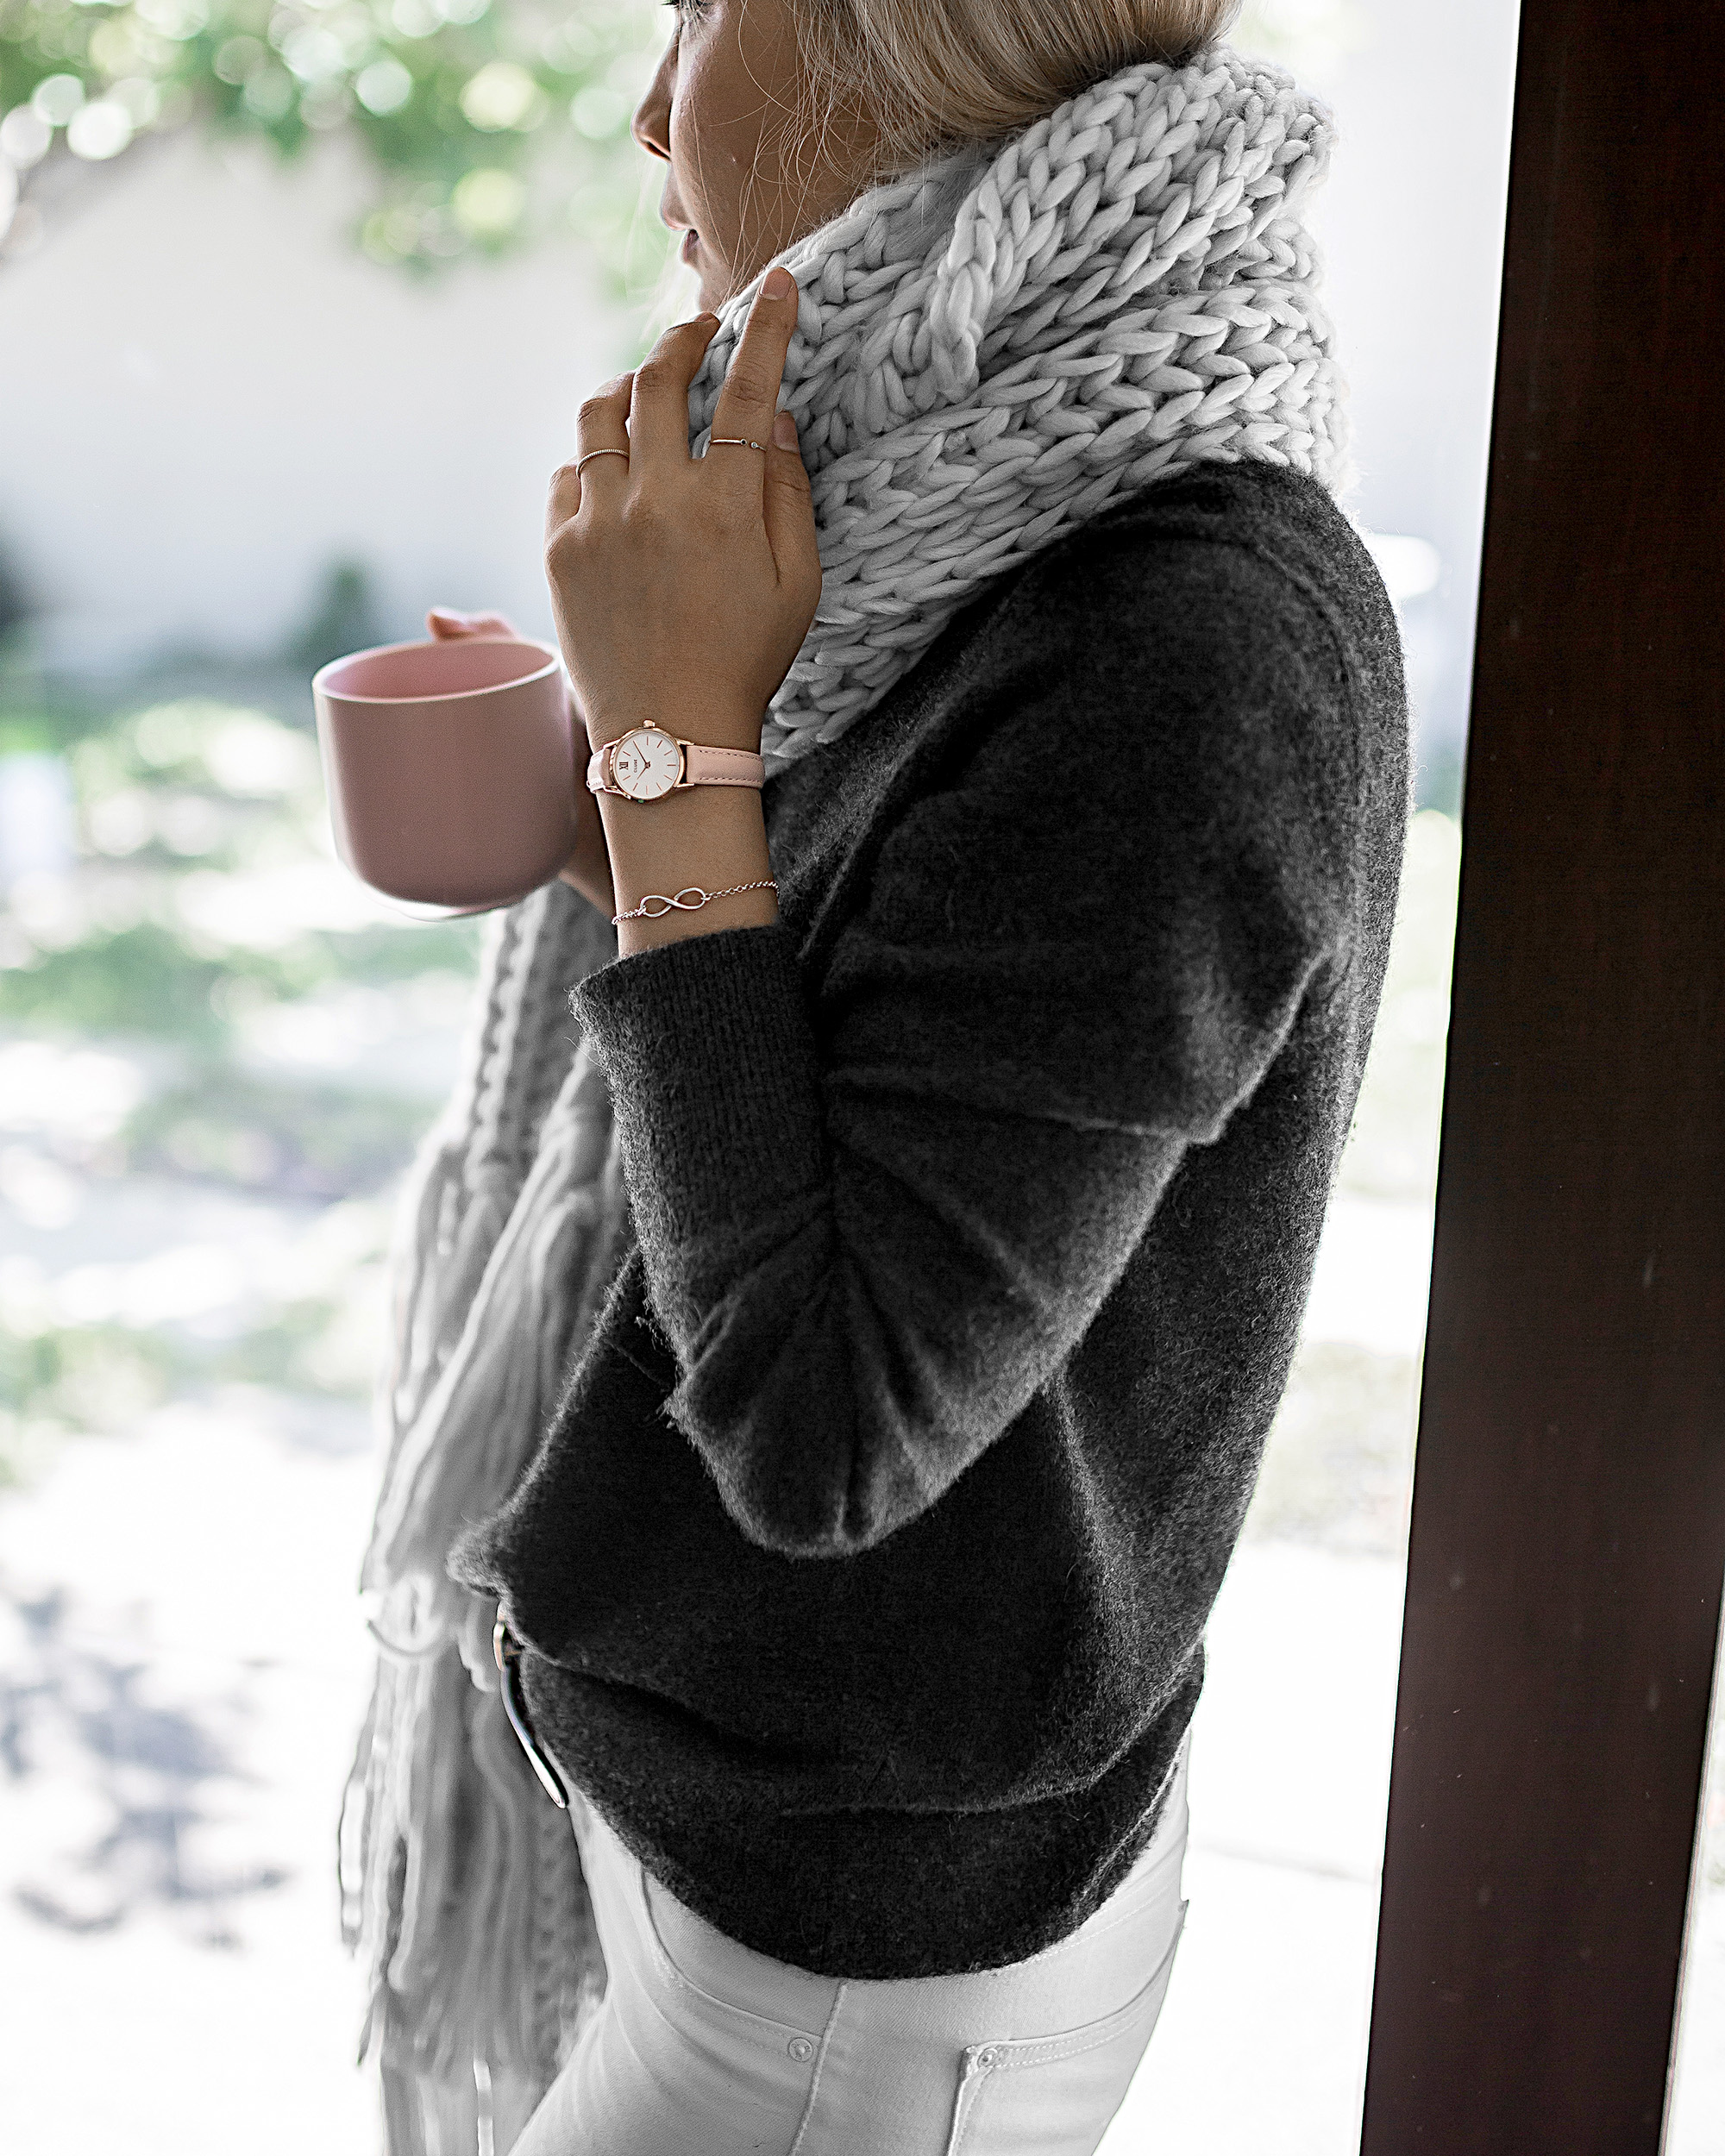 chunky-scarf-adidas-superstar-coffee-morning-inspiration-9-copy